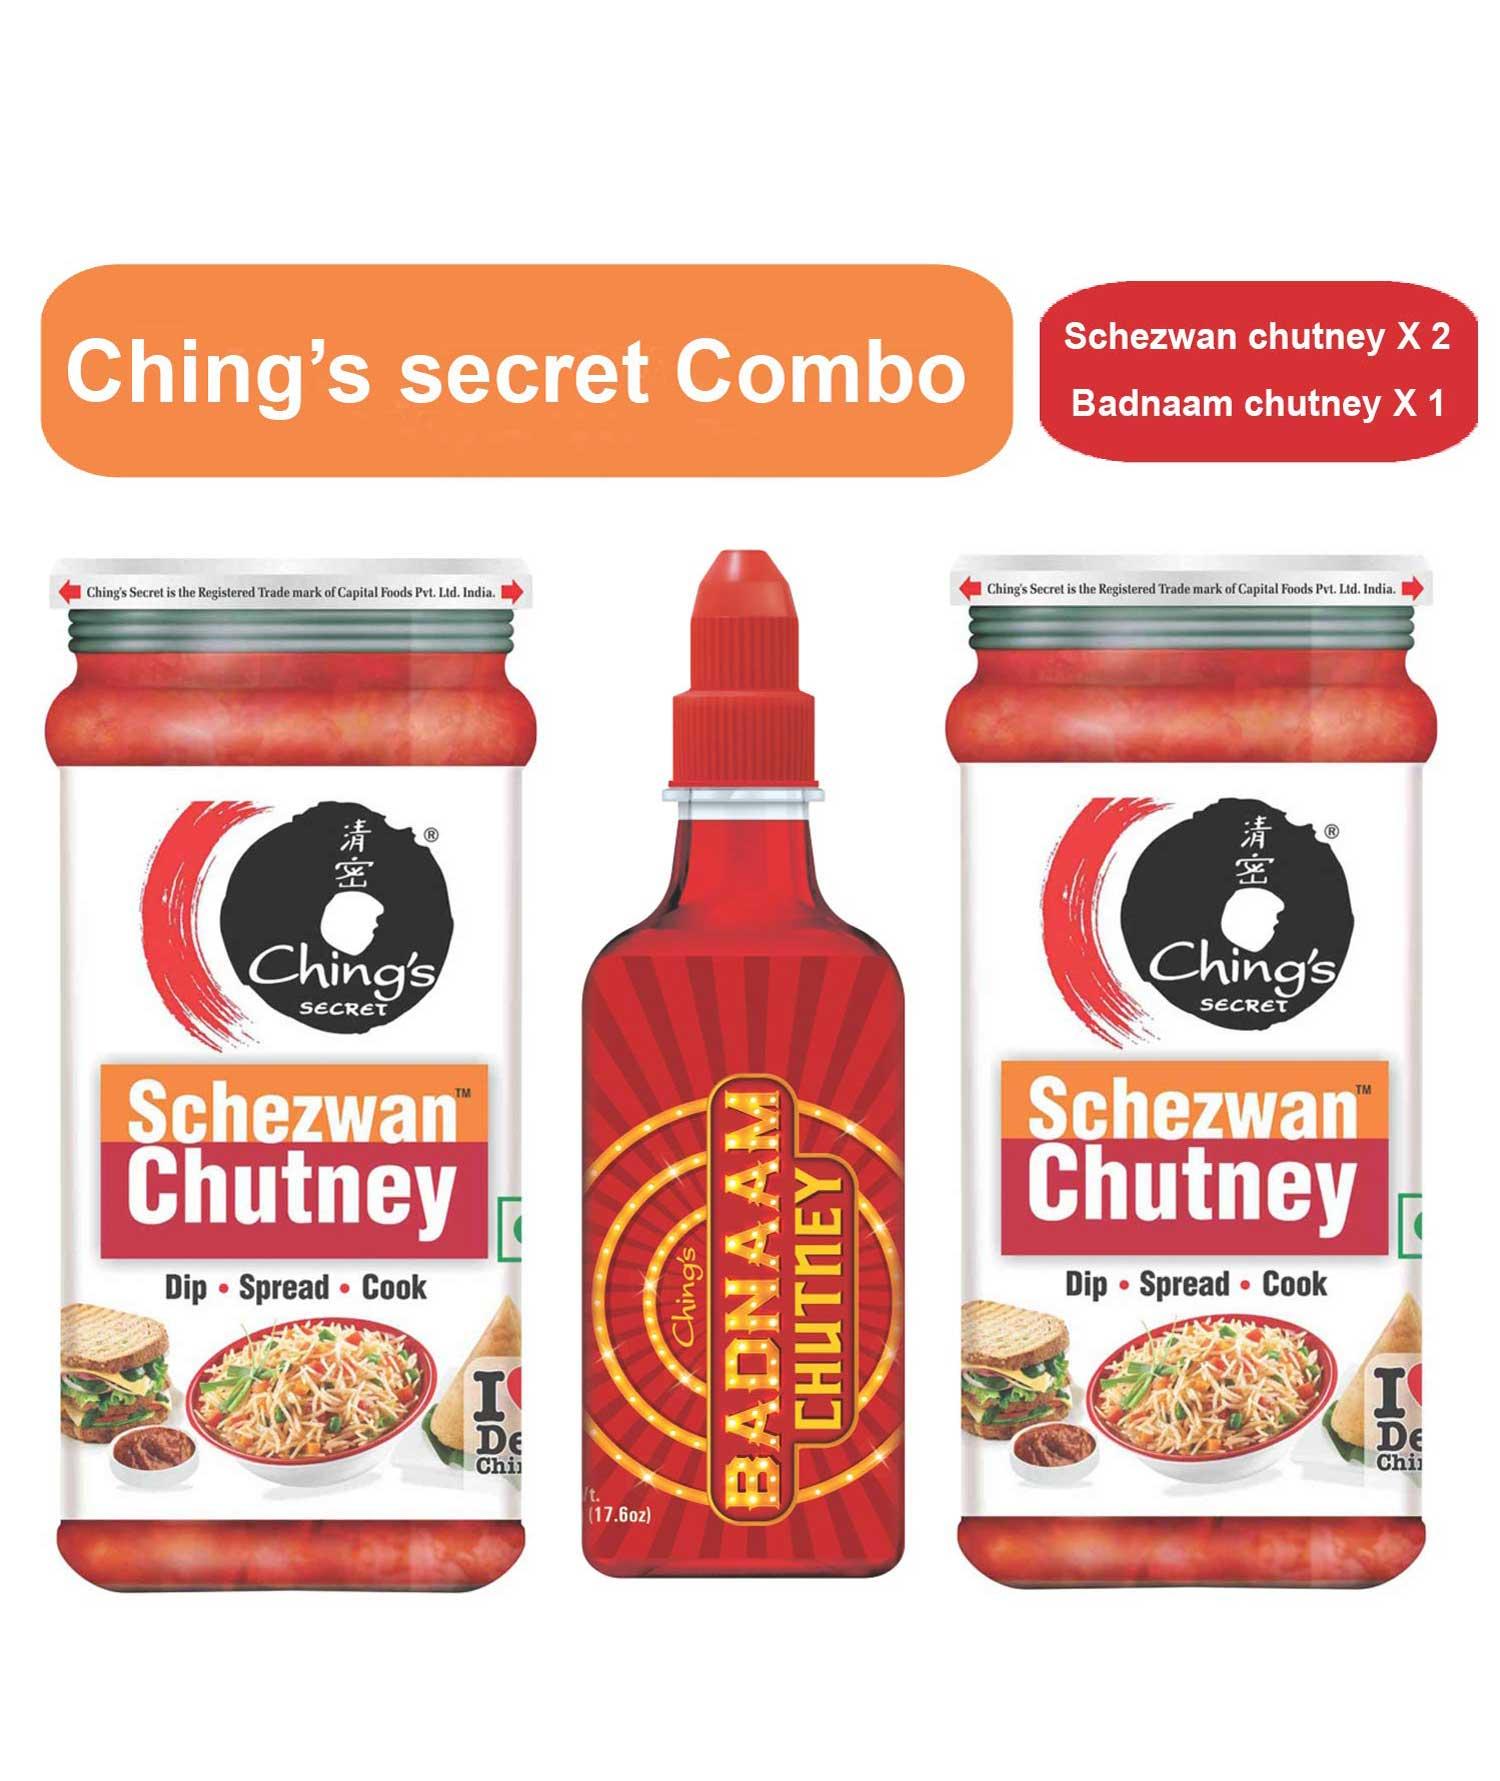 Chings Secret Combo of Schezwan Chutney X 2 and Badnaam Chutney X 1 (Pack of 3)